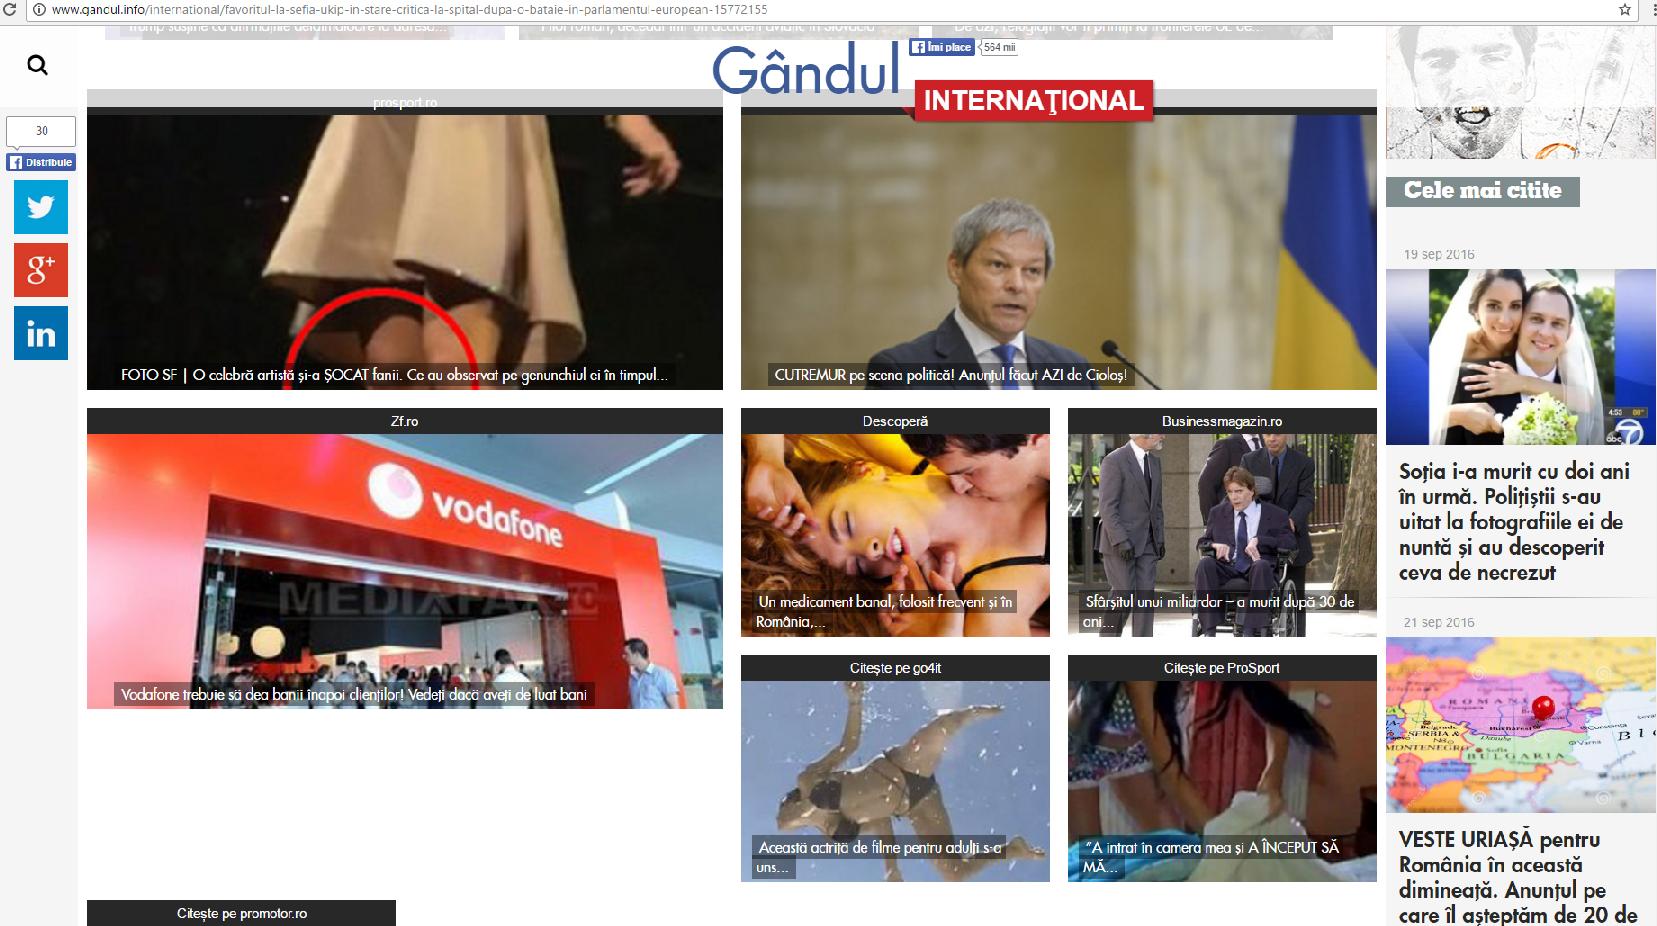 http://www.gandul.info/international/favoritul-la-sefia-ukip-in-stare-critica-la-spital-dupa-o-bataie-in-parlamentul-european-15772155